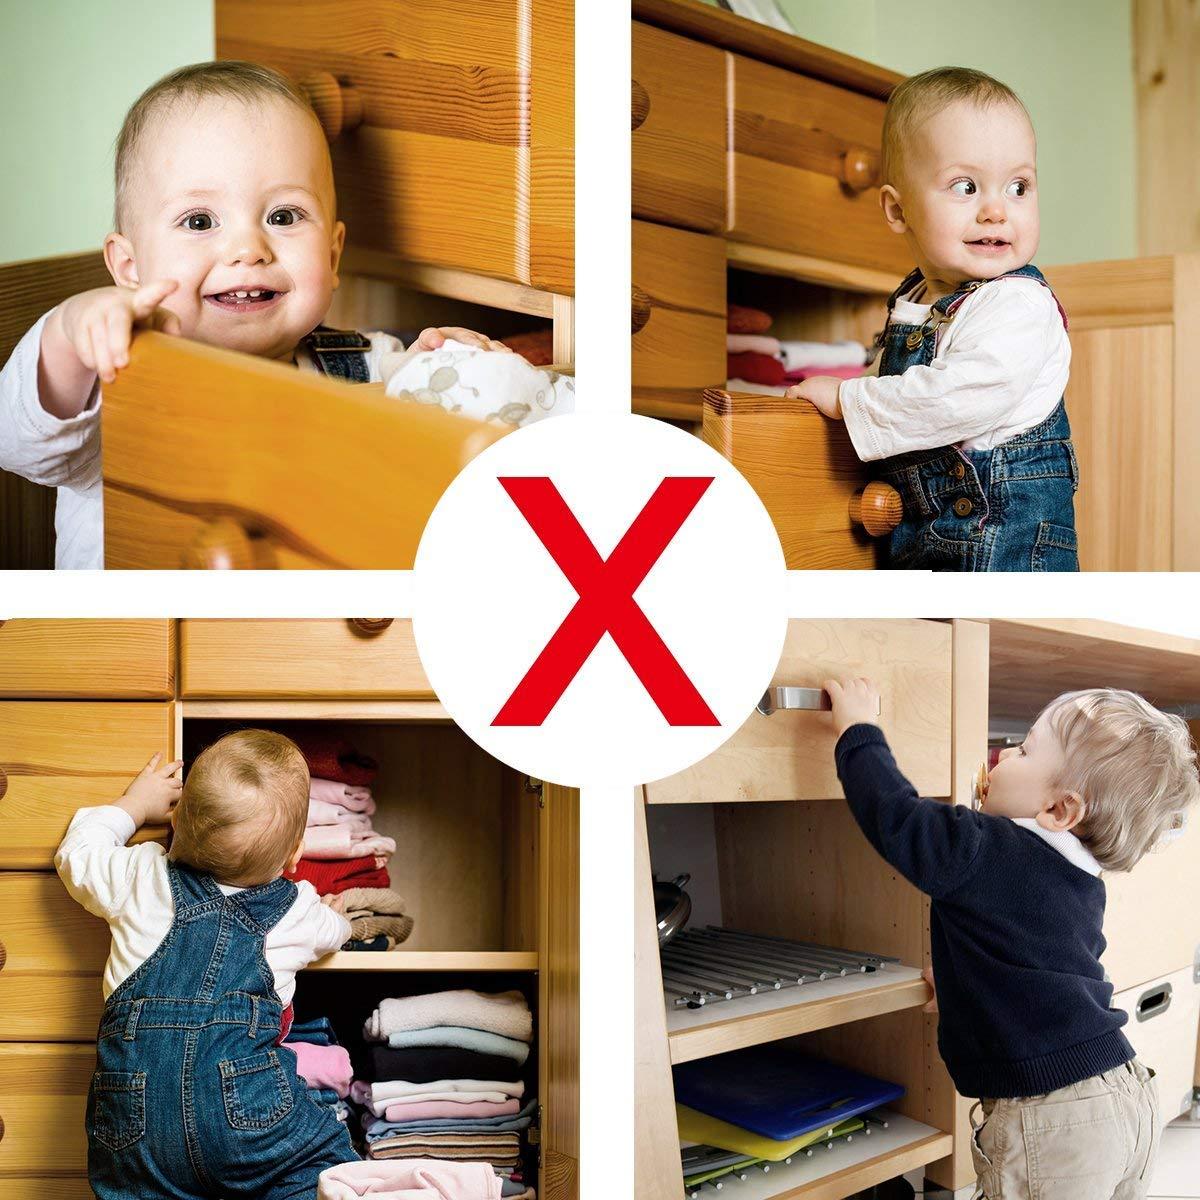 10 Locks+2 Keys 16 Locks /& 3 Keys Baby Safety Magnetic Cabinet Lock Set HURRISE Child Safety Locks Kids Toddler Proofing Hidden Cupboard Drawer Locking System No Drilling /& Screws